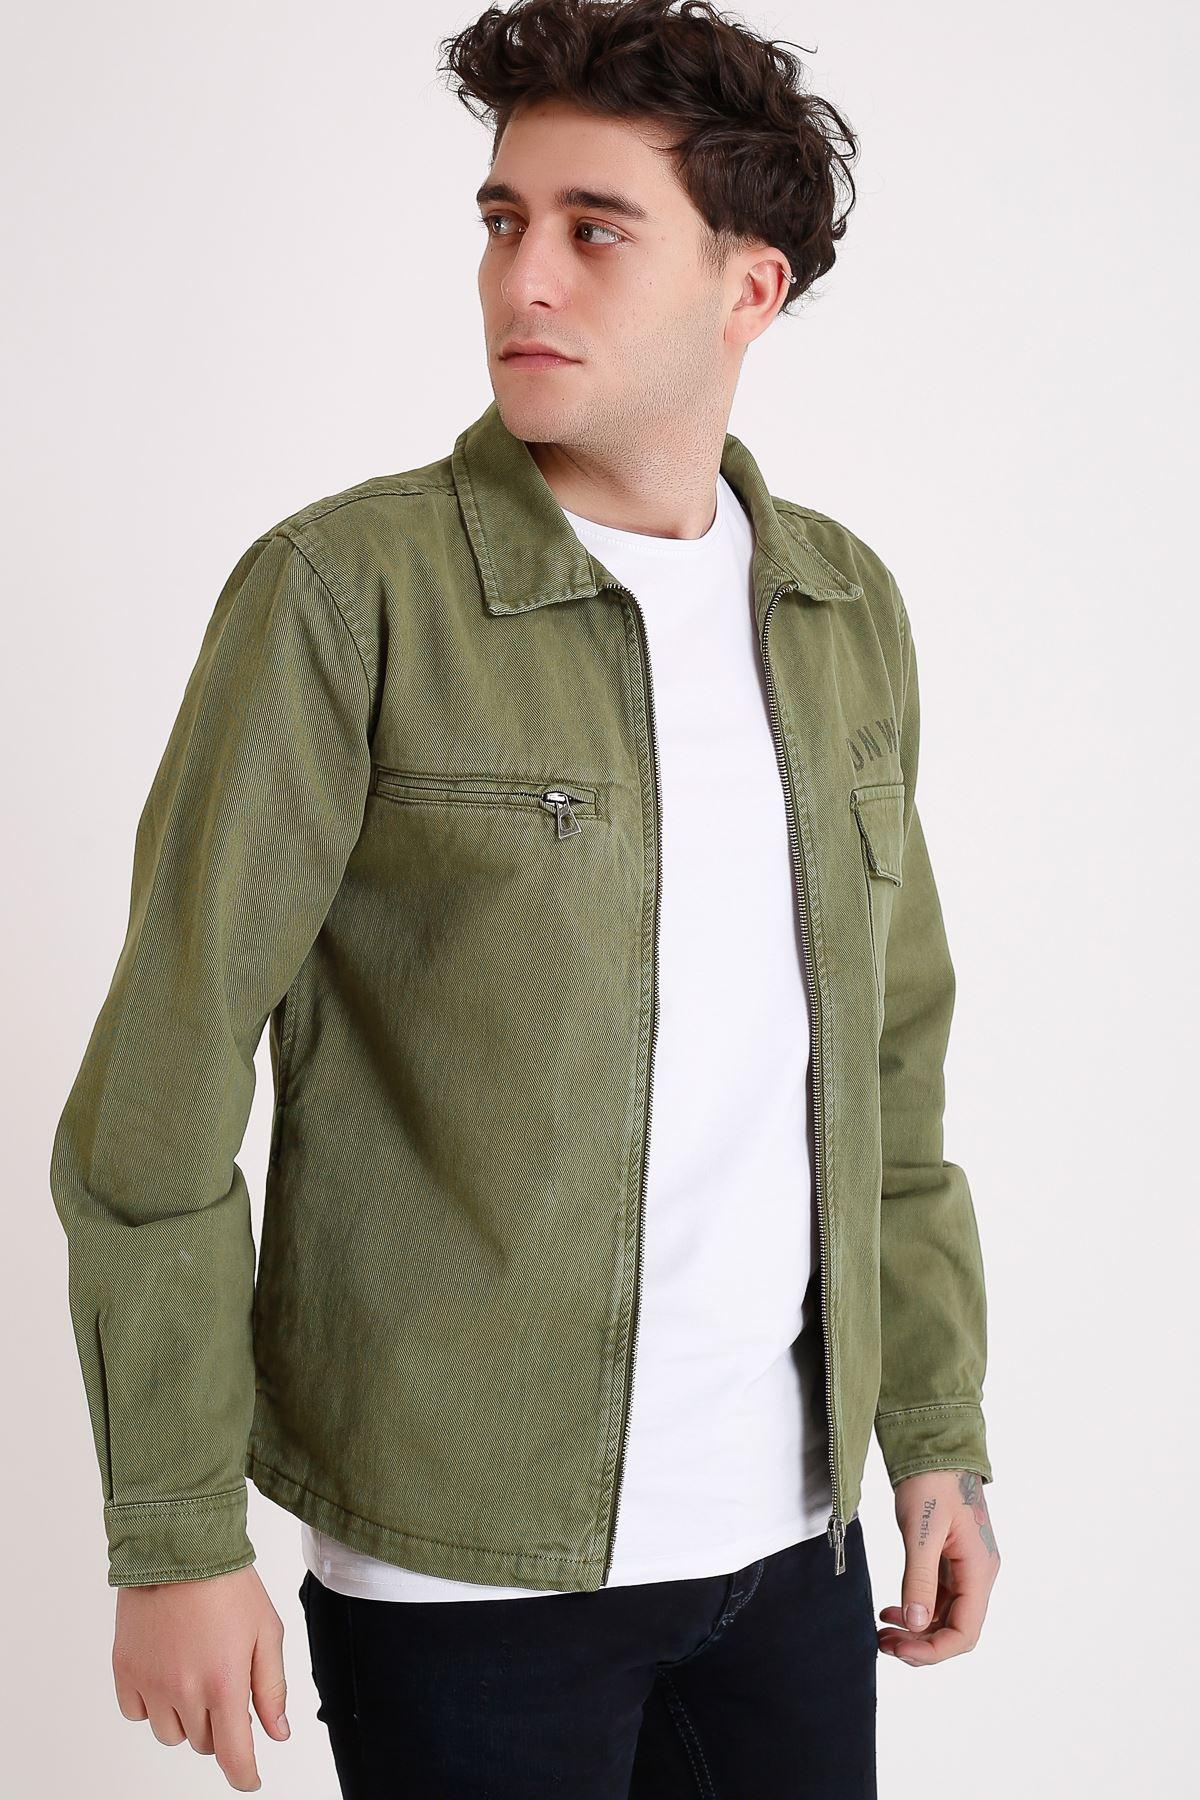 Premium Pamuklu Haki Ceket Cep Fermuar Ve Detay Baskı